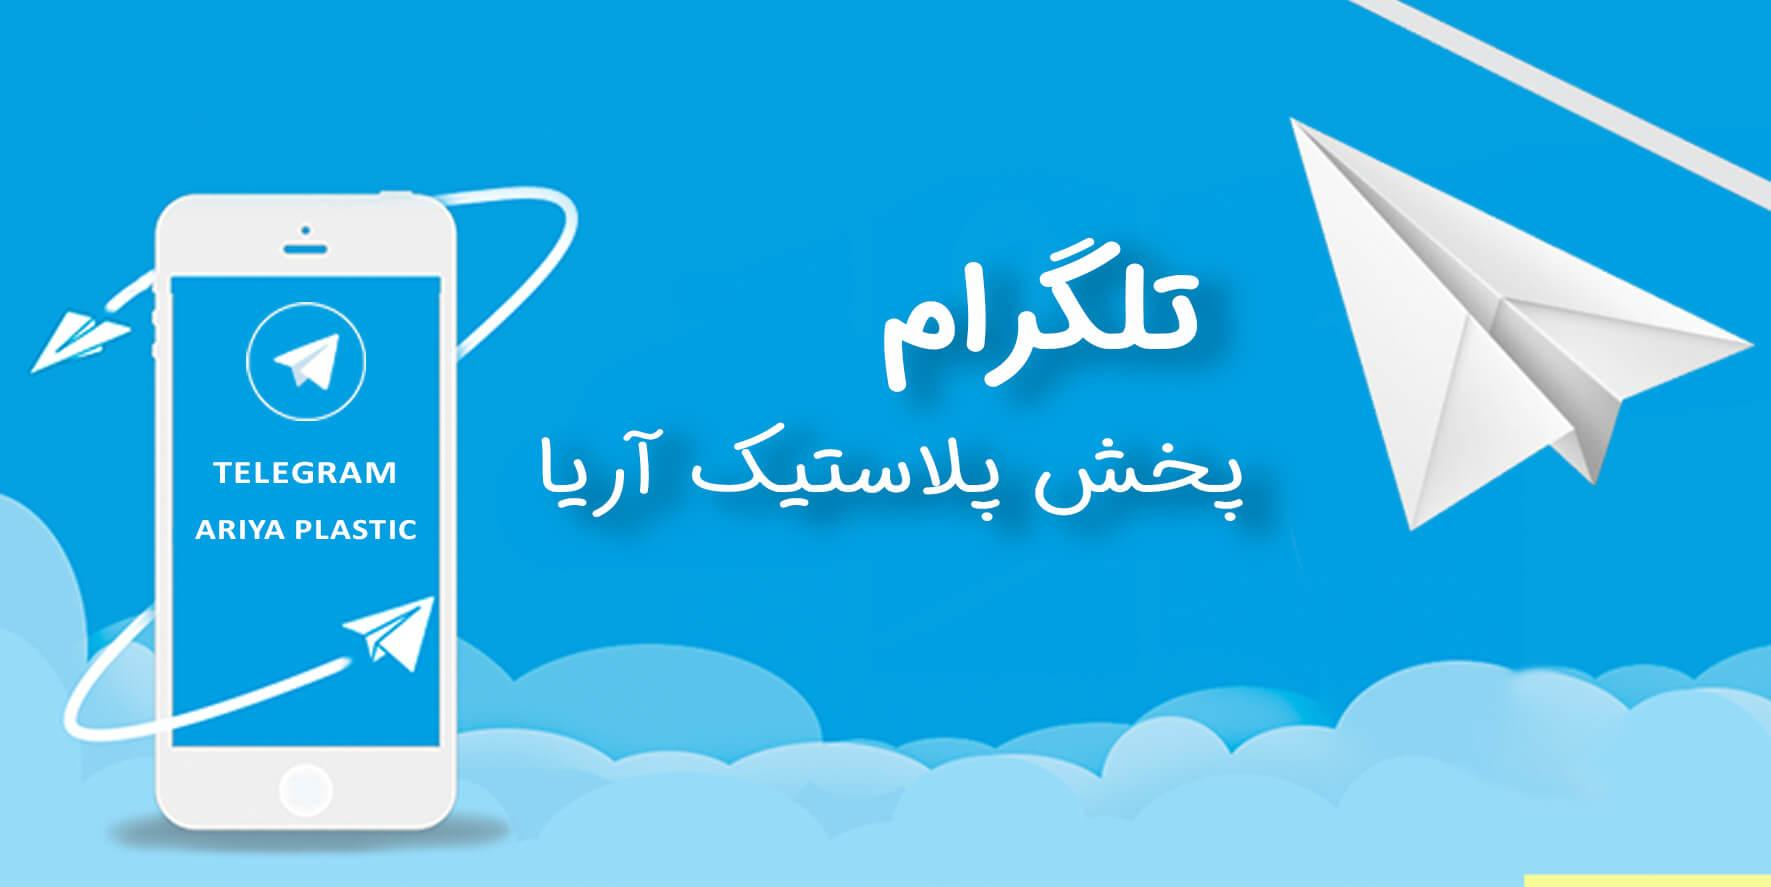 کانال تلگرام پخش آریا